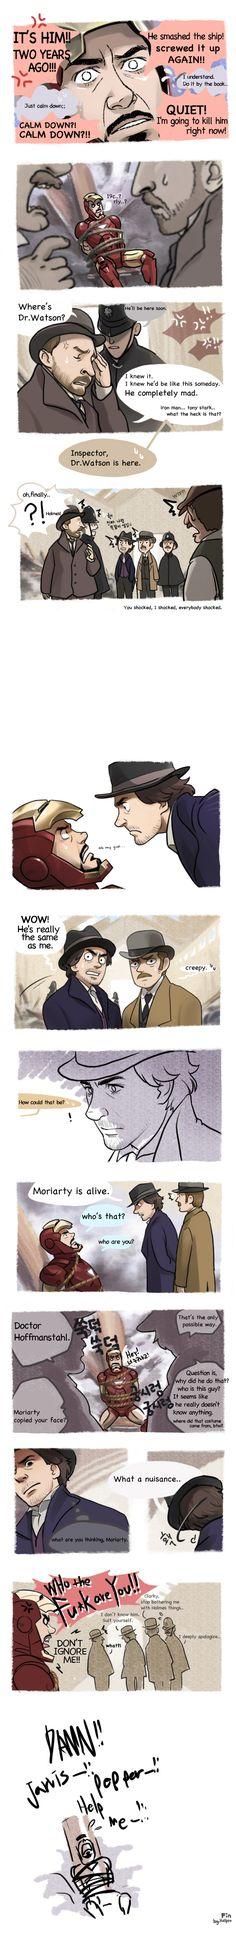 """Iron Man x Sherlock Holmes Crossover, Part 2"" by Hallpen"